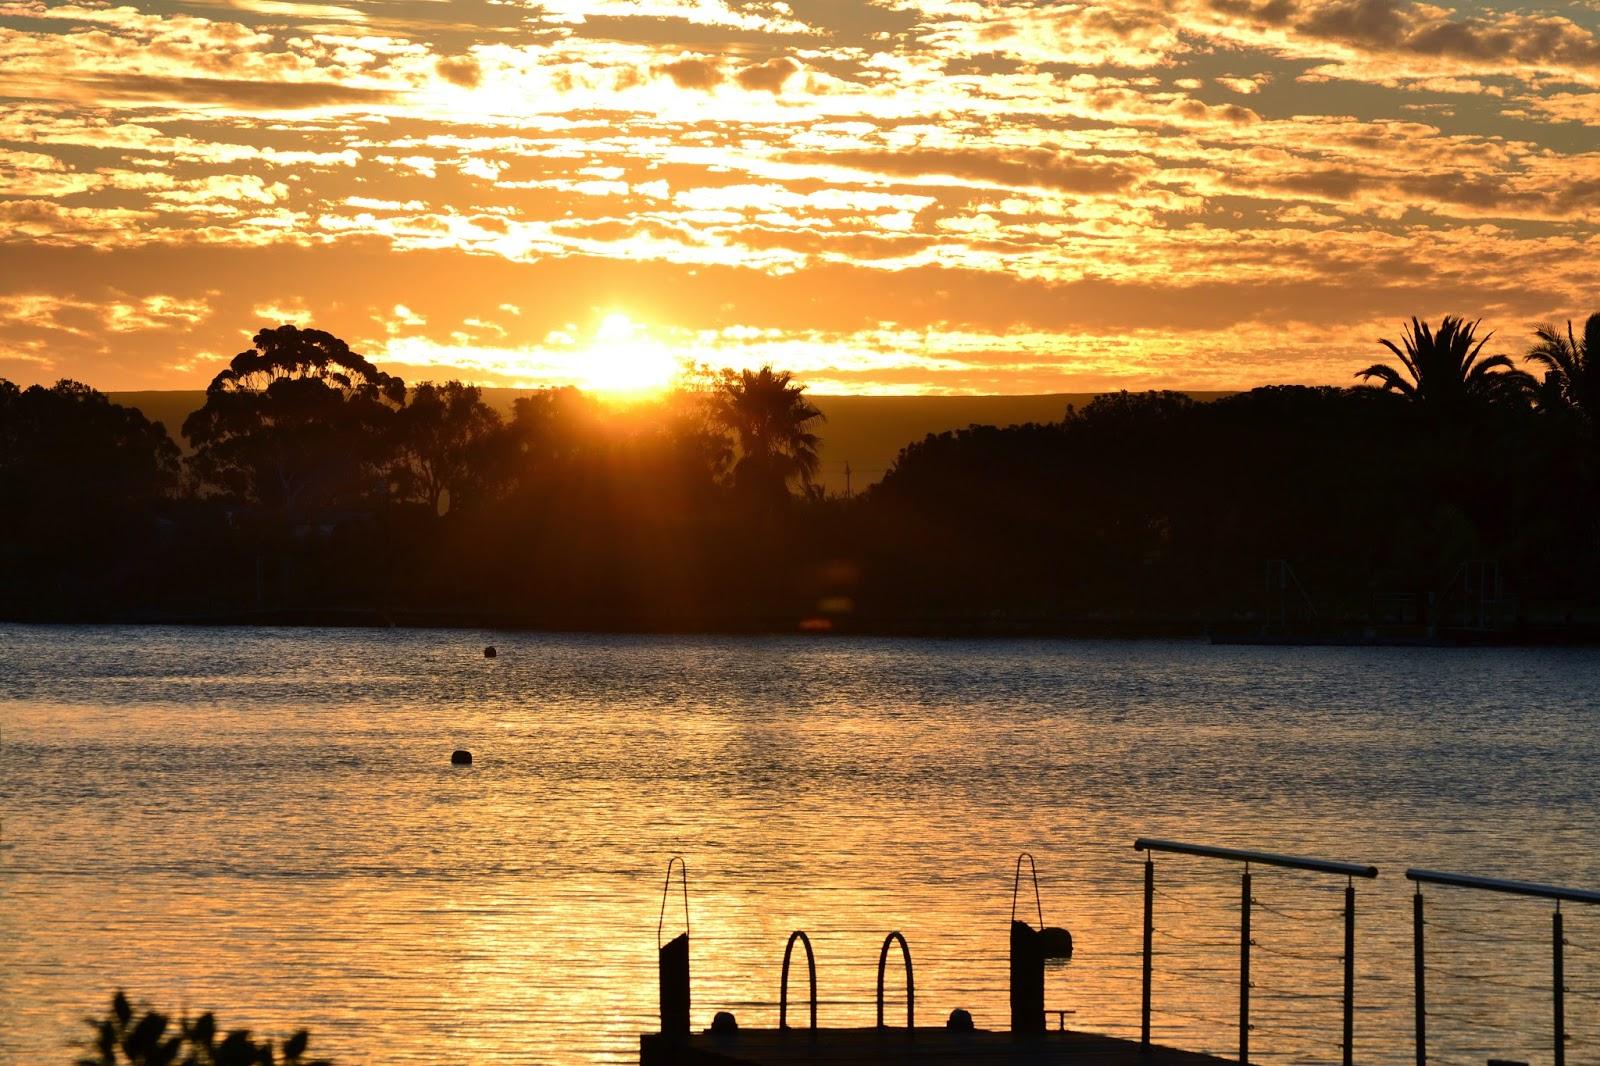 golden sunset over the marina